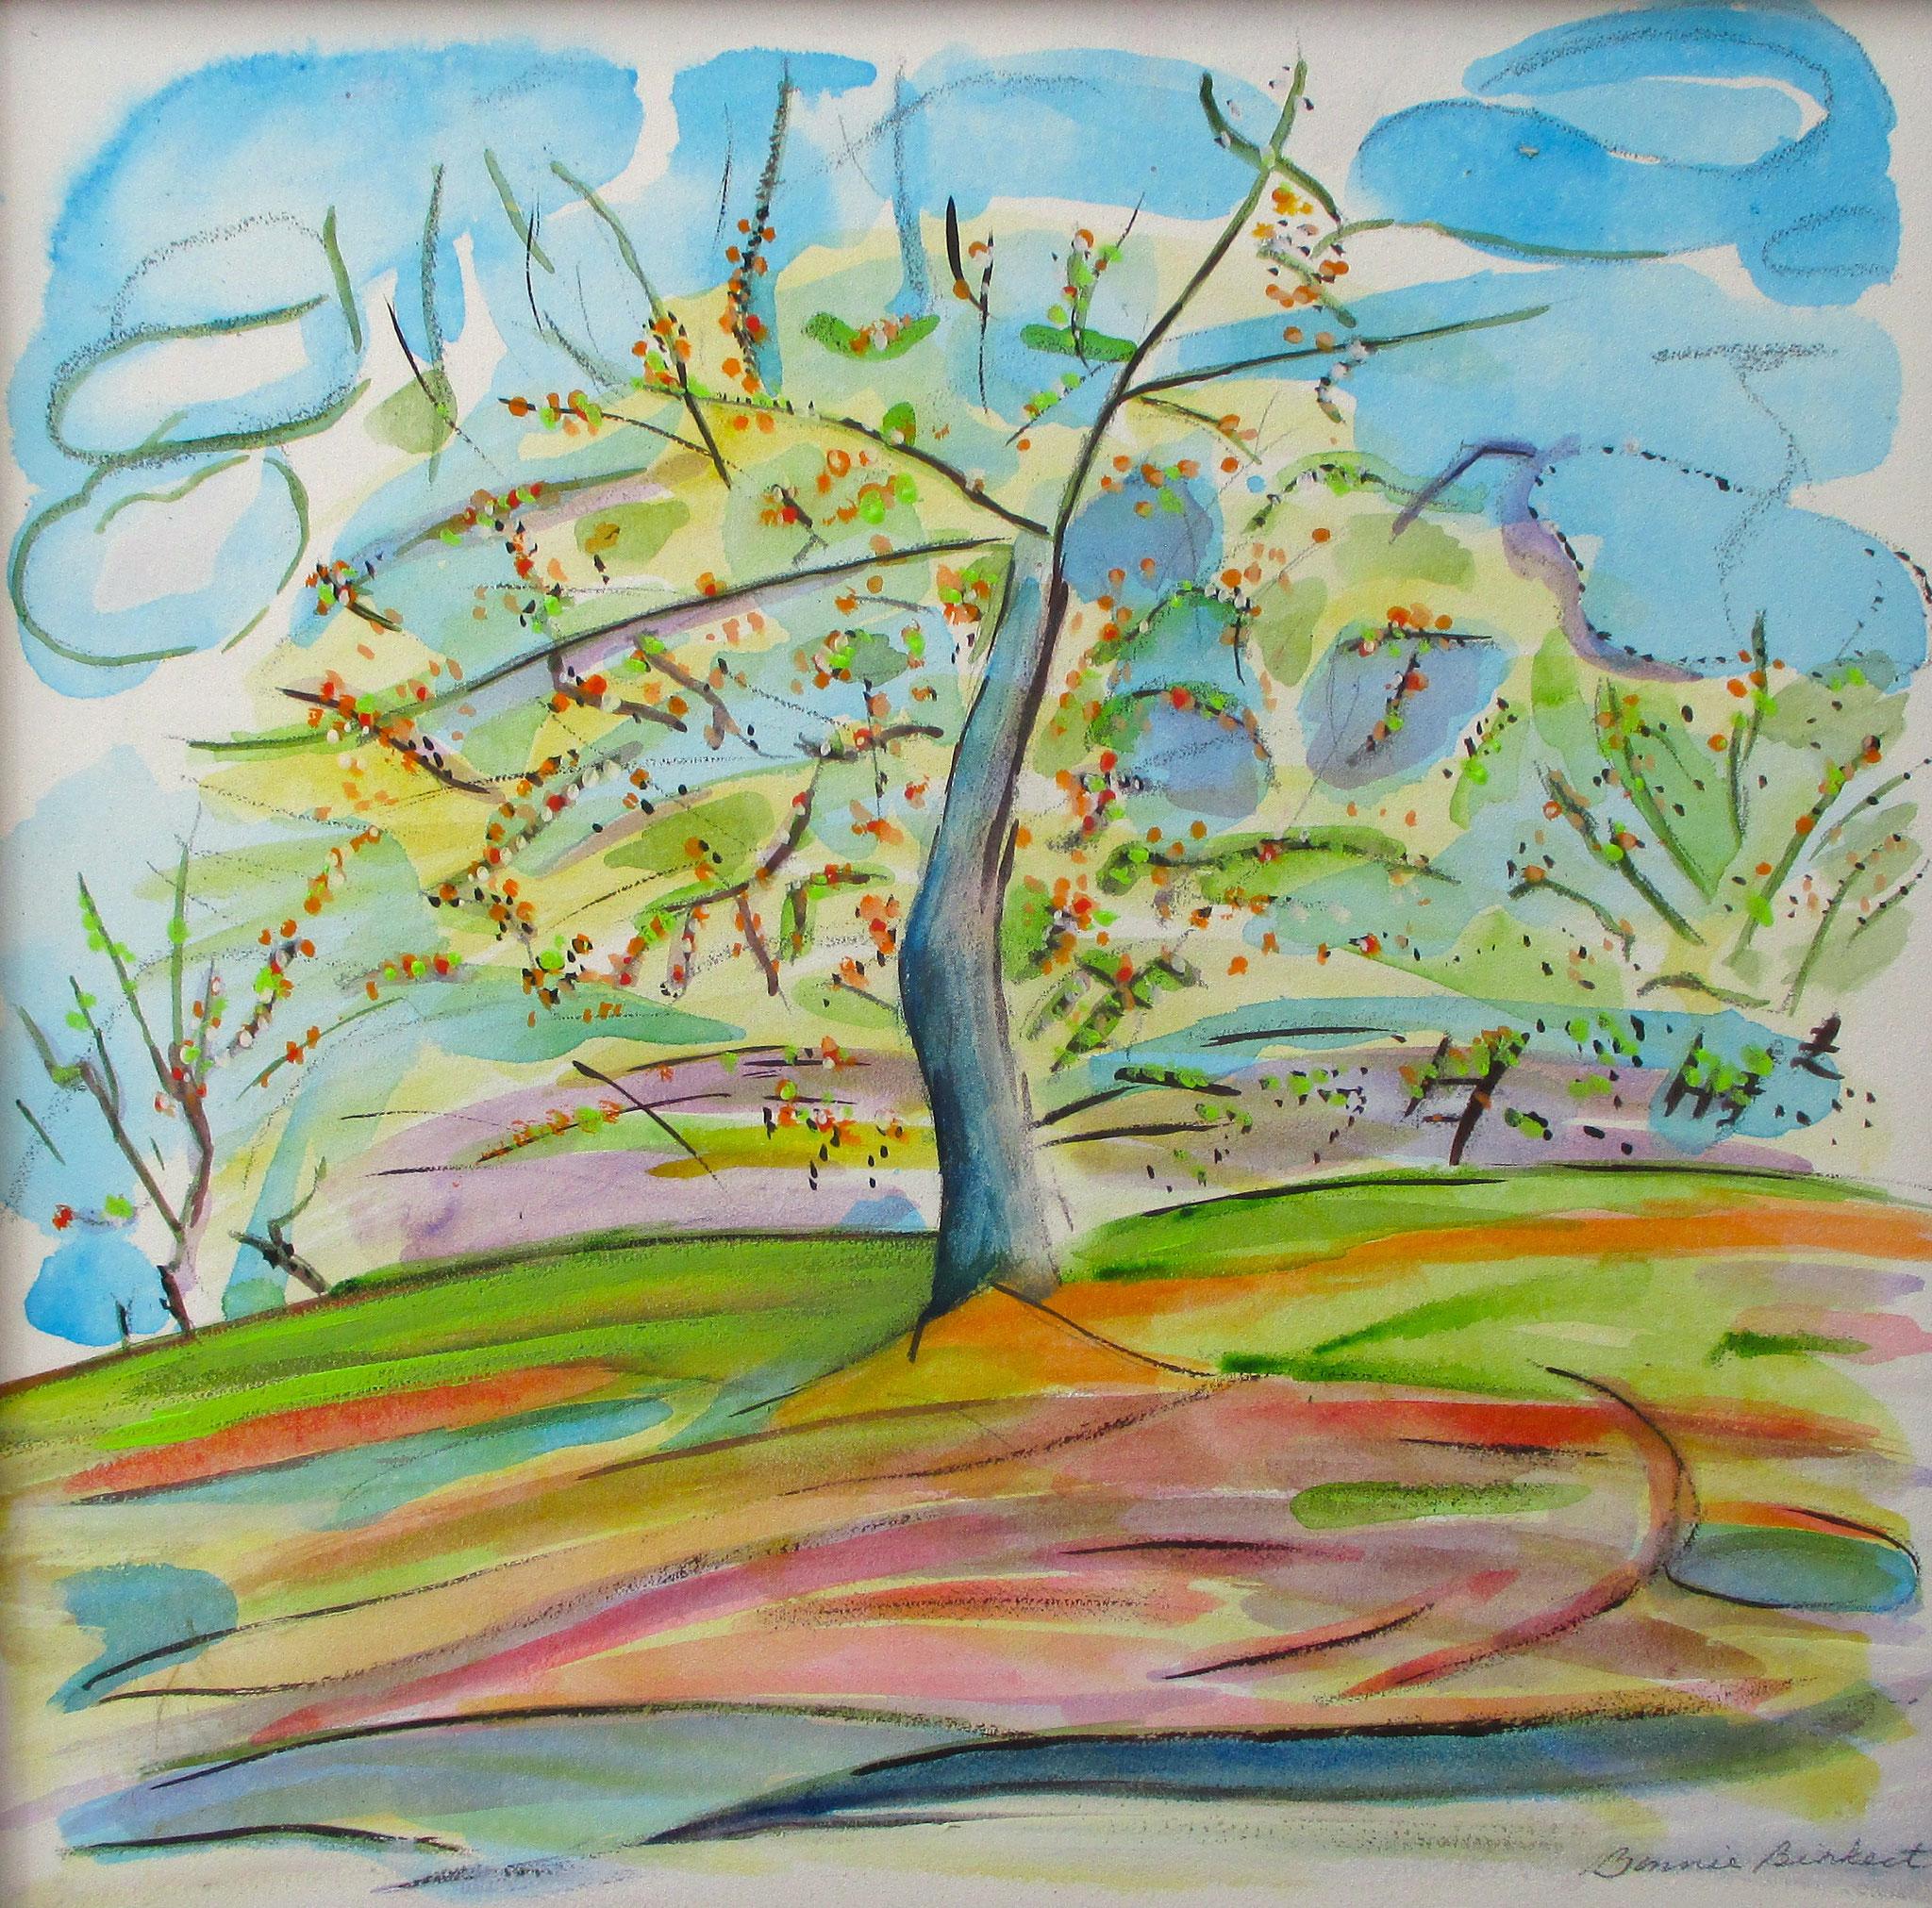 Apricot Season, watercolor on board, 12 x 12, 2016